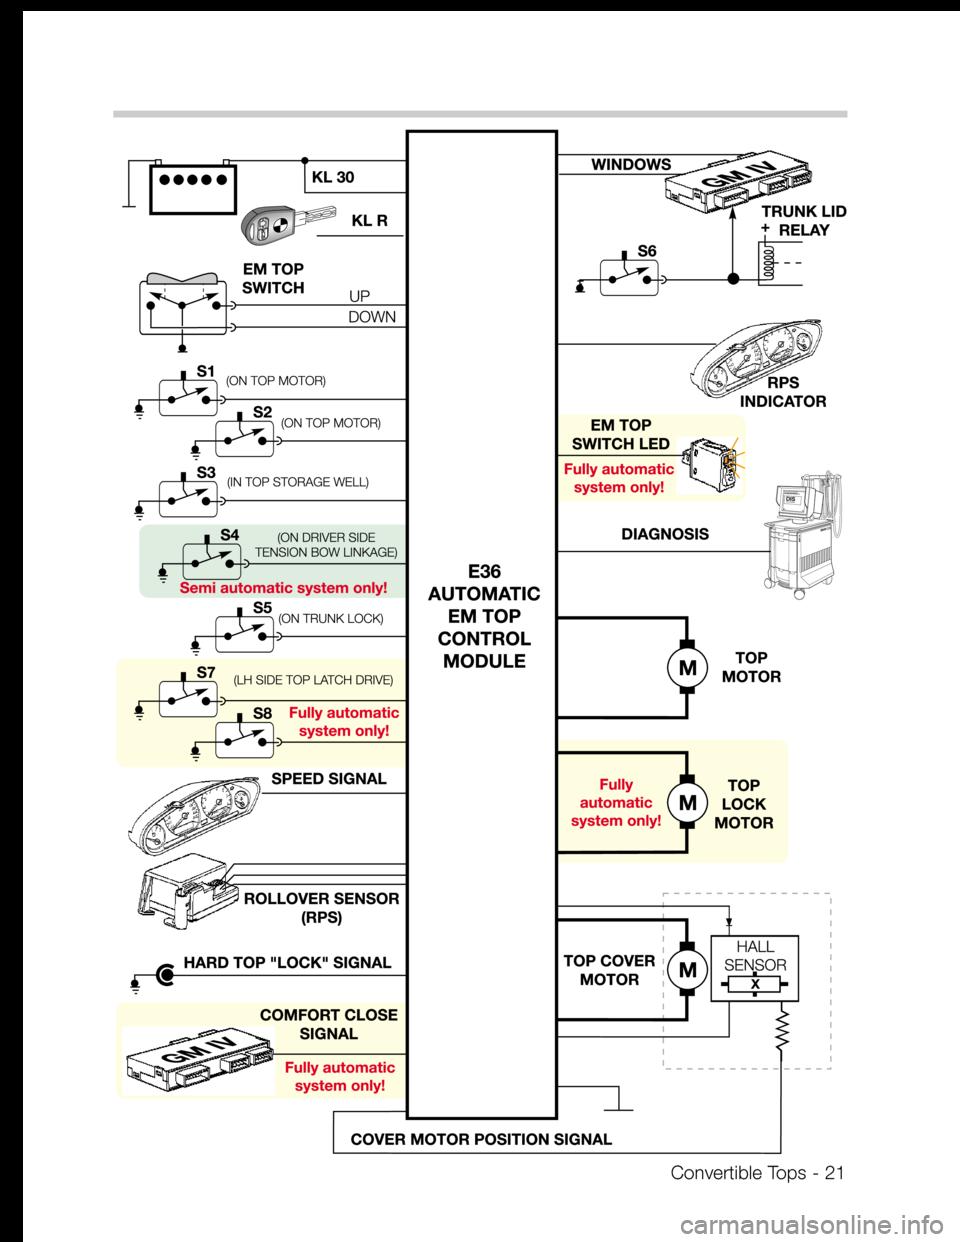 Bmw Z3 Convertible 1995 E36 Tops Manual 2 8 Engine Diagram